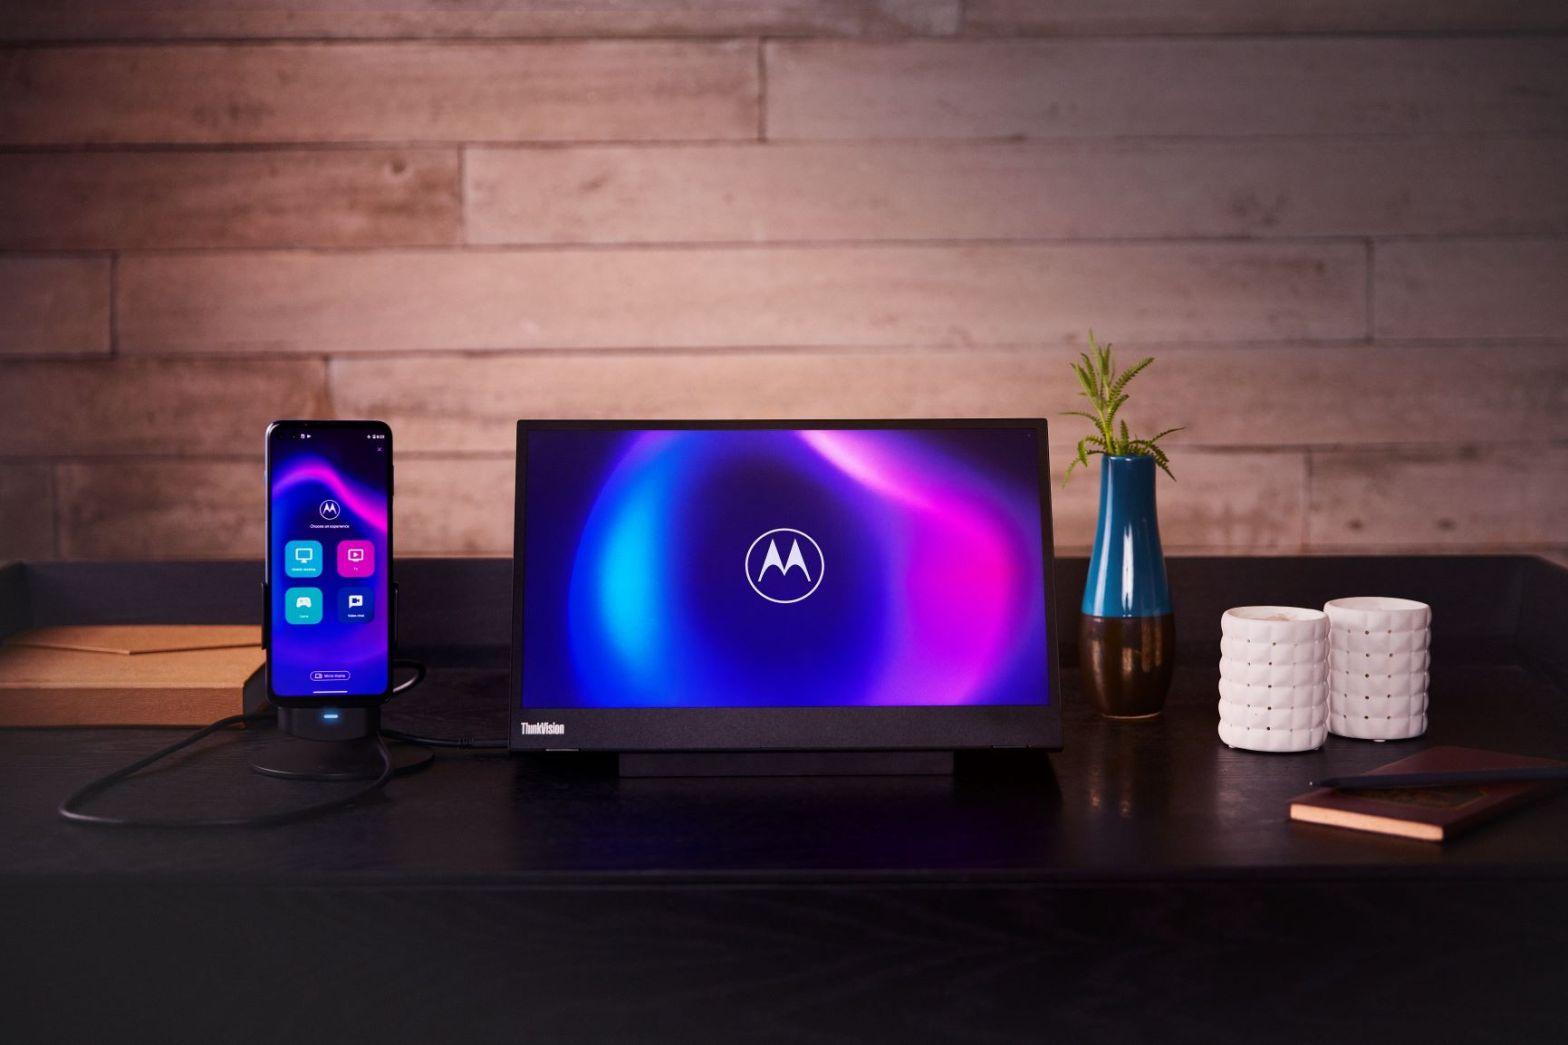 Motorola creció en Perú y logra récord histórico de Market Share